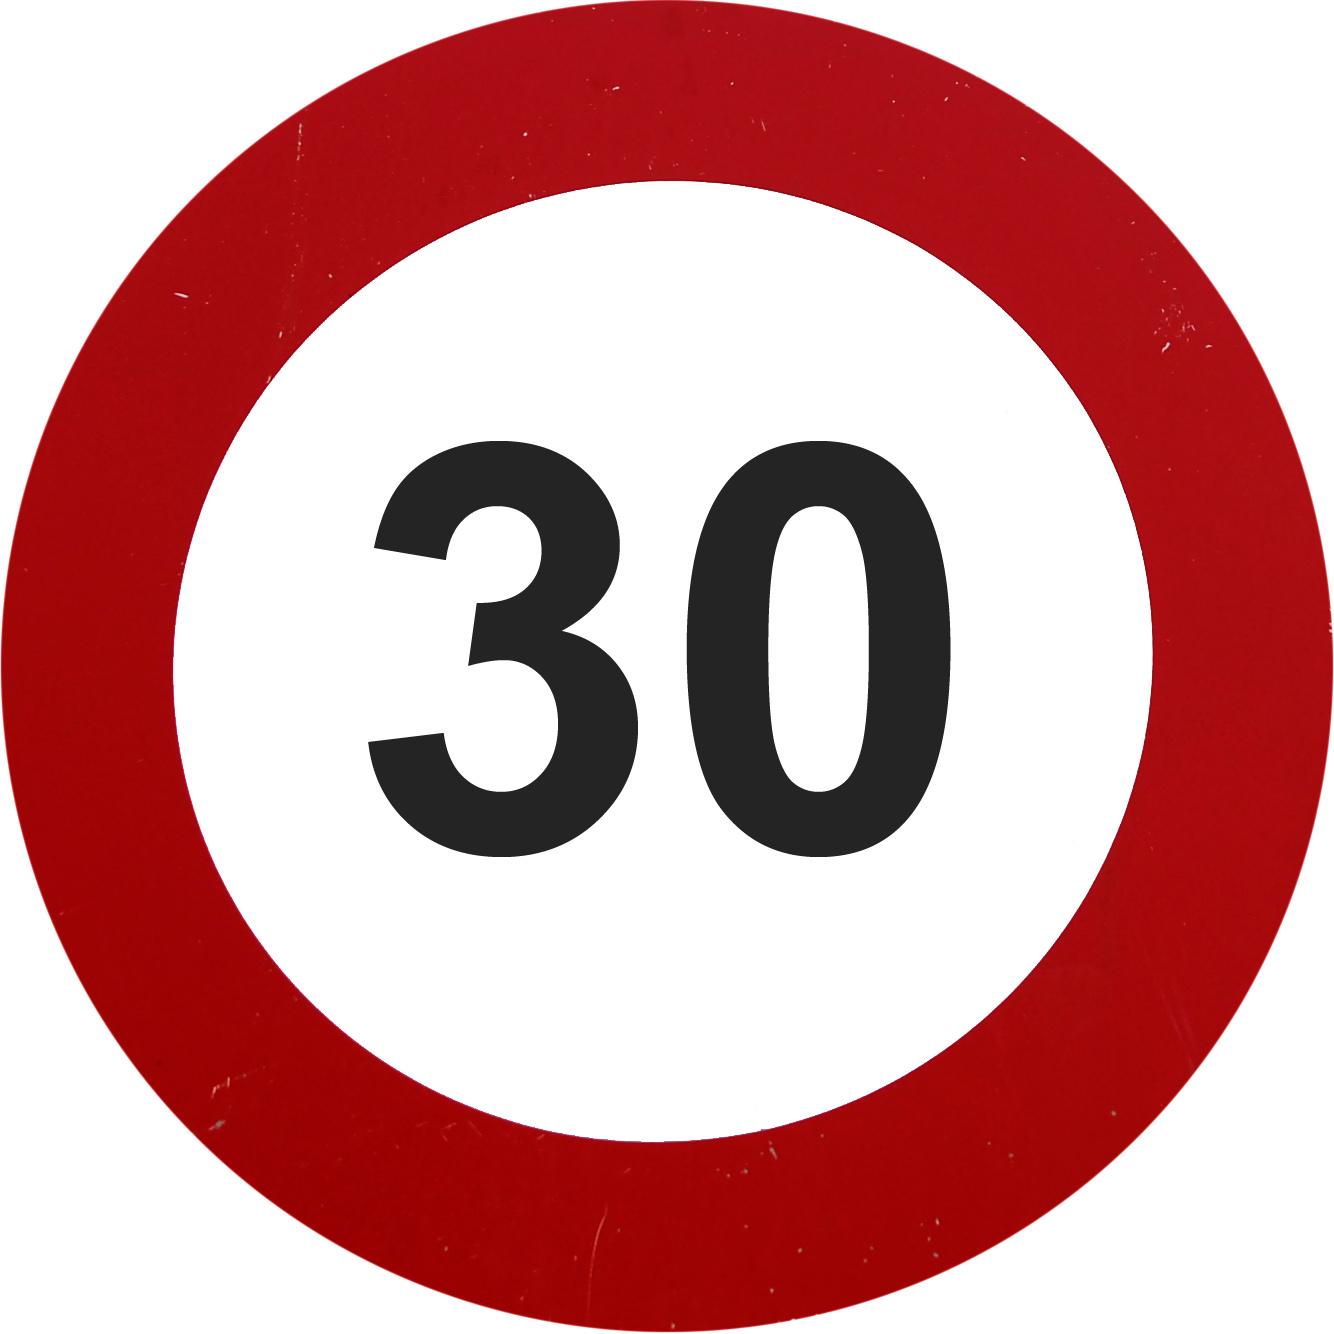 30 speed limit round sign download free textures.